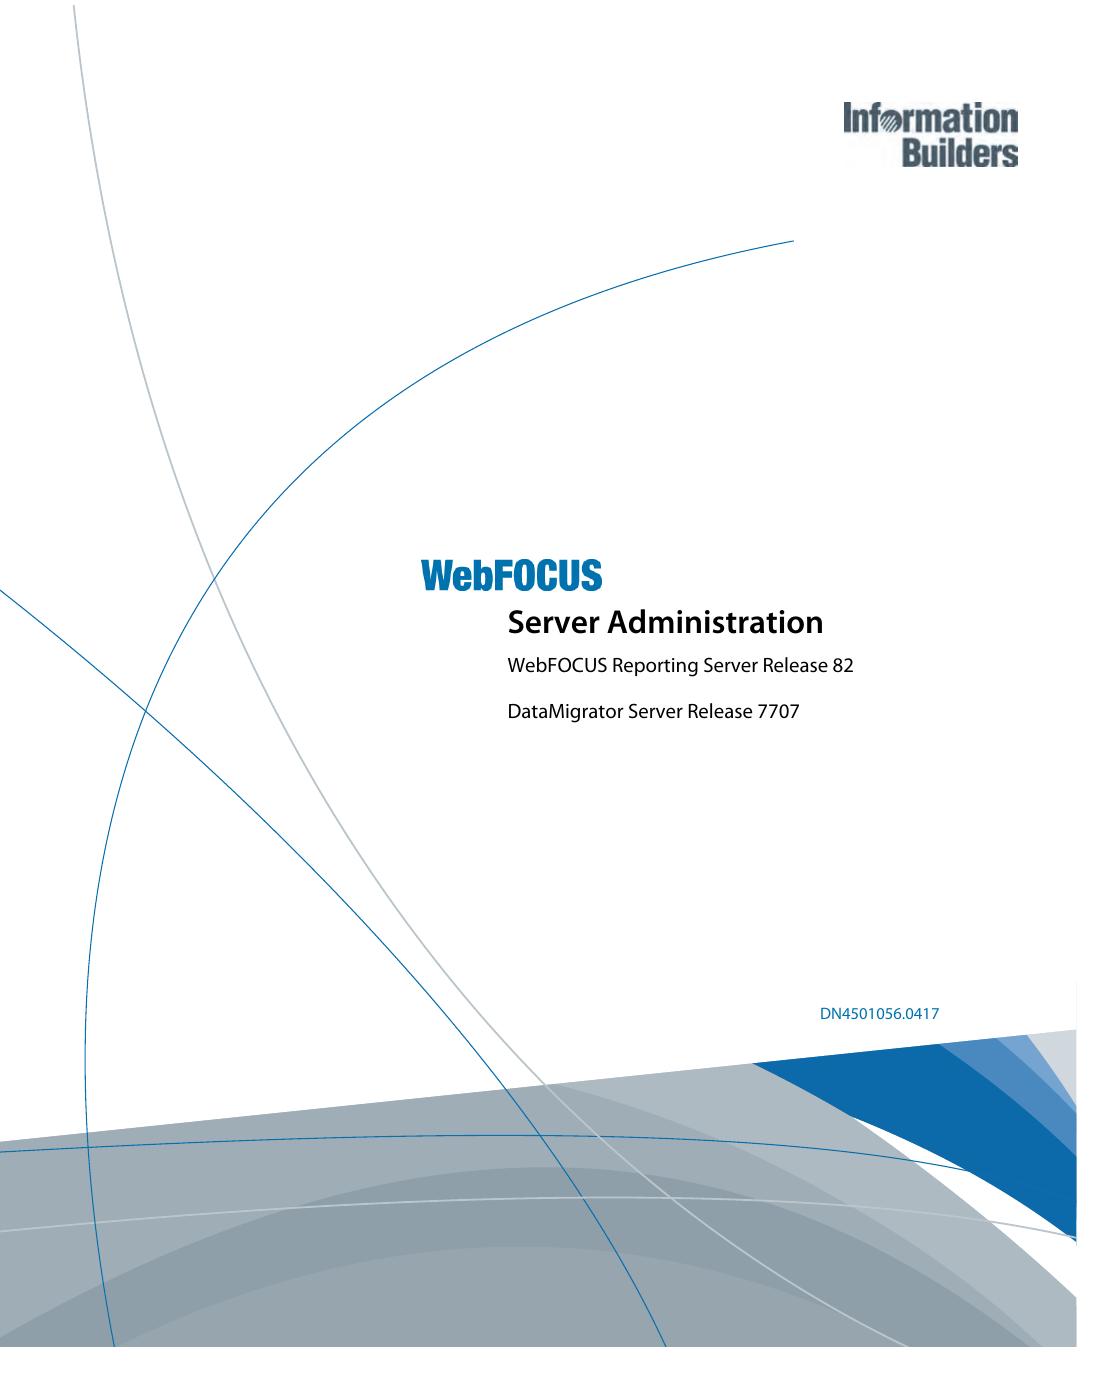 Server Administration - WebFOCUS Reporting Server Release 82